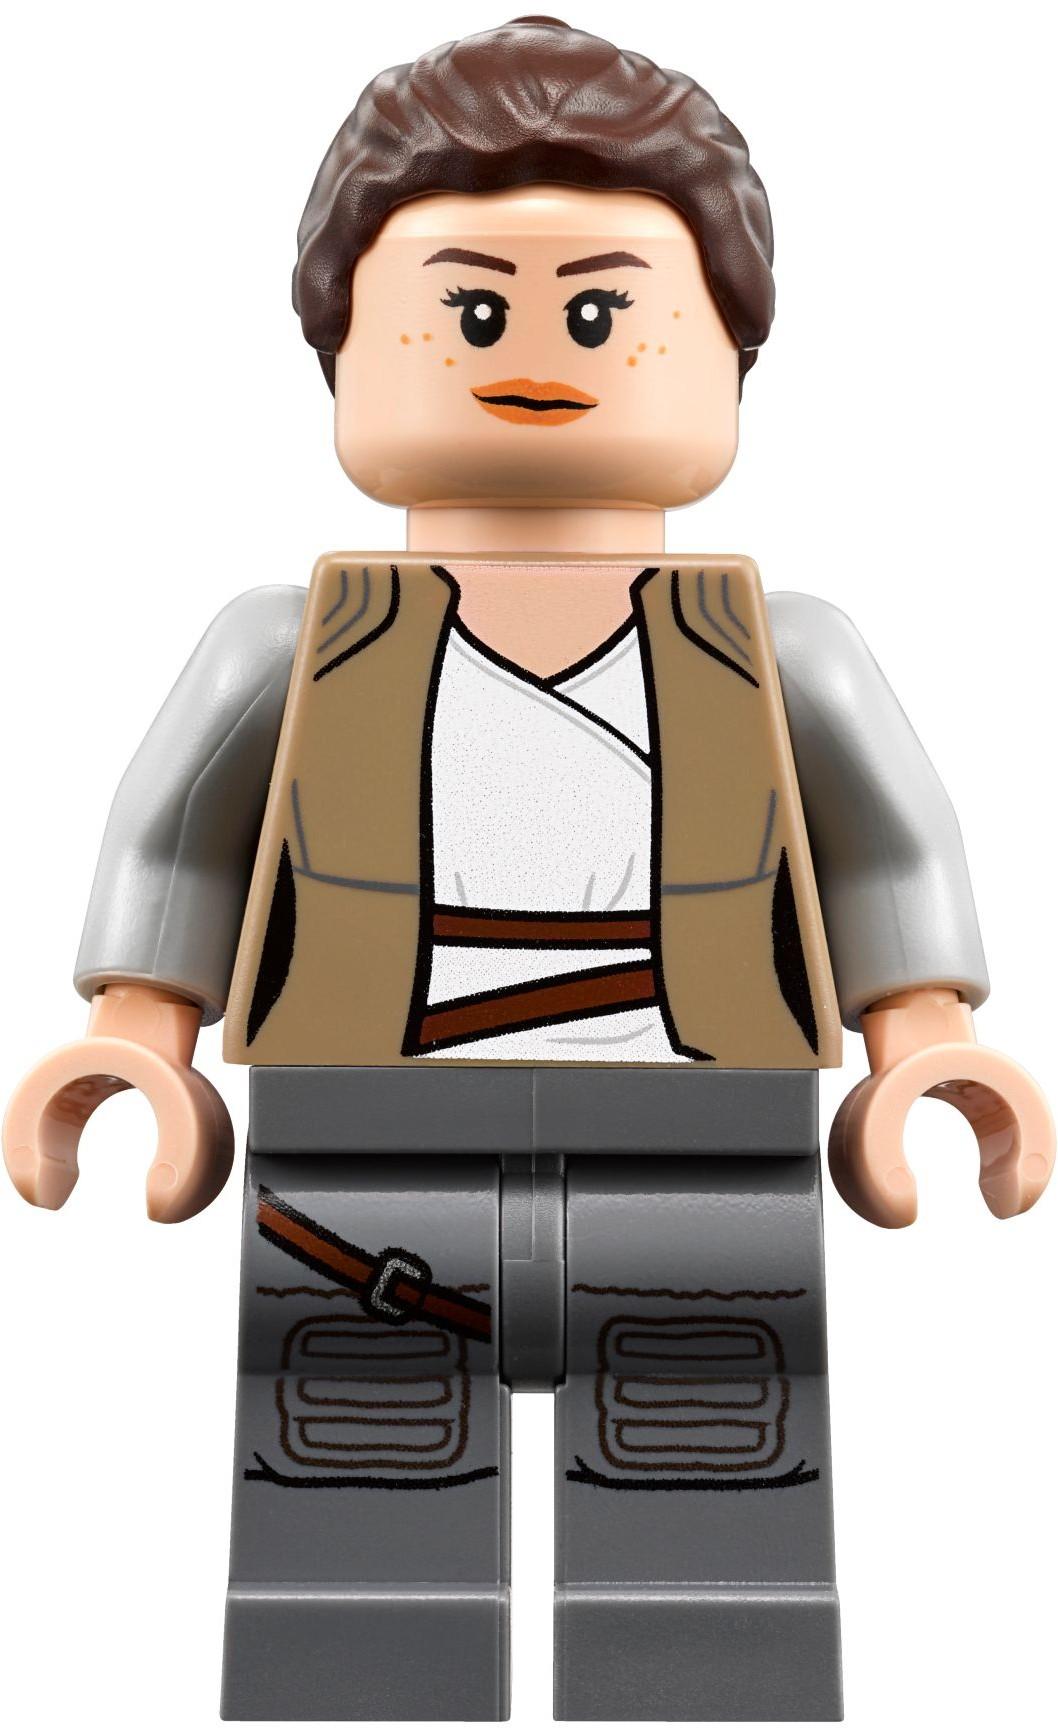 LEGO NEW MINIFIGURE TORSO WITH REDDISH BROWN HANDS FINN STAR WARS PIECE JACKET